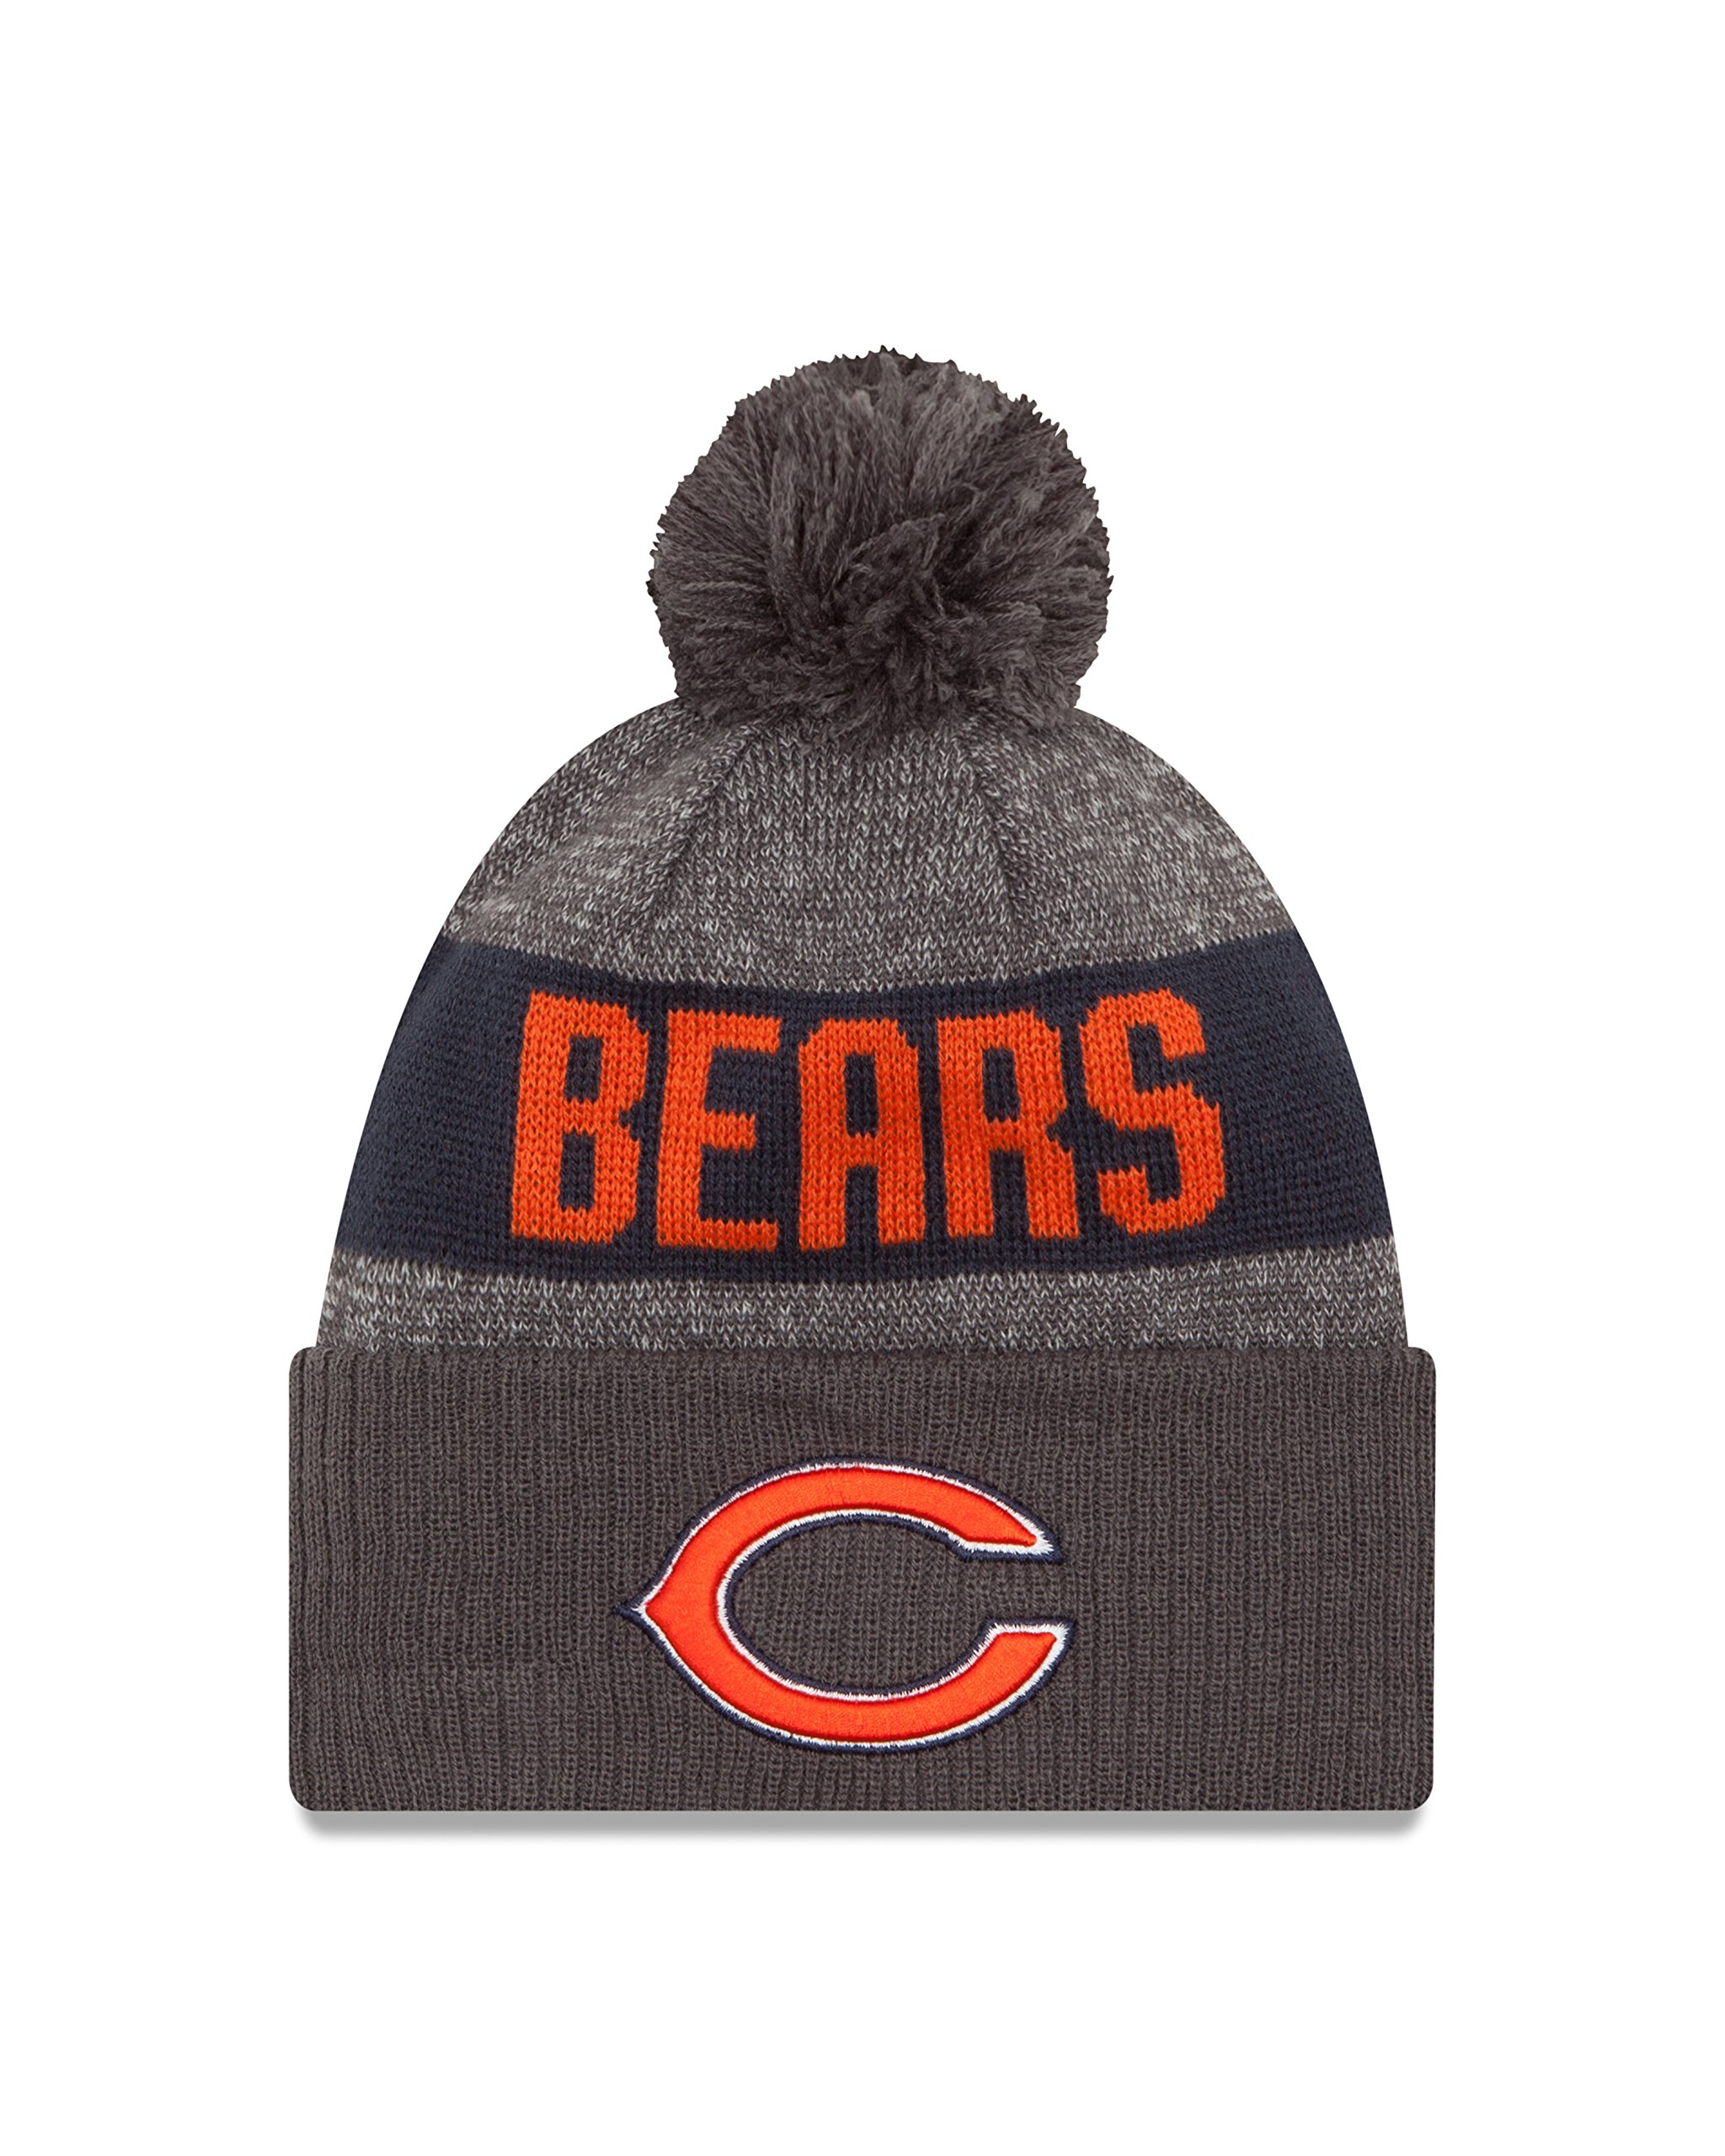 New Era NFL Chicago Bears 2016 Sport Knit Beanie, One Size, Graphite